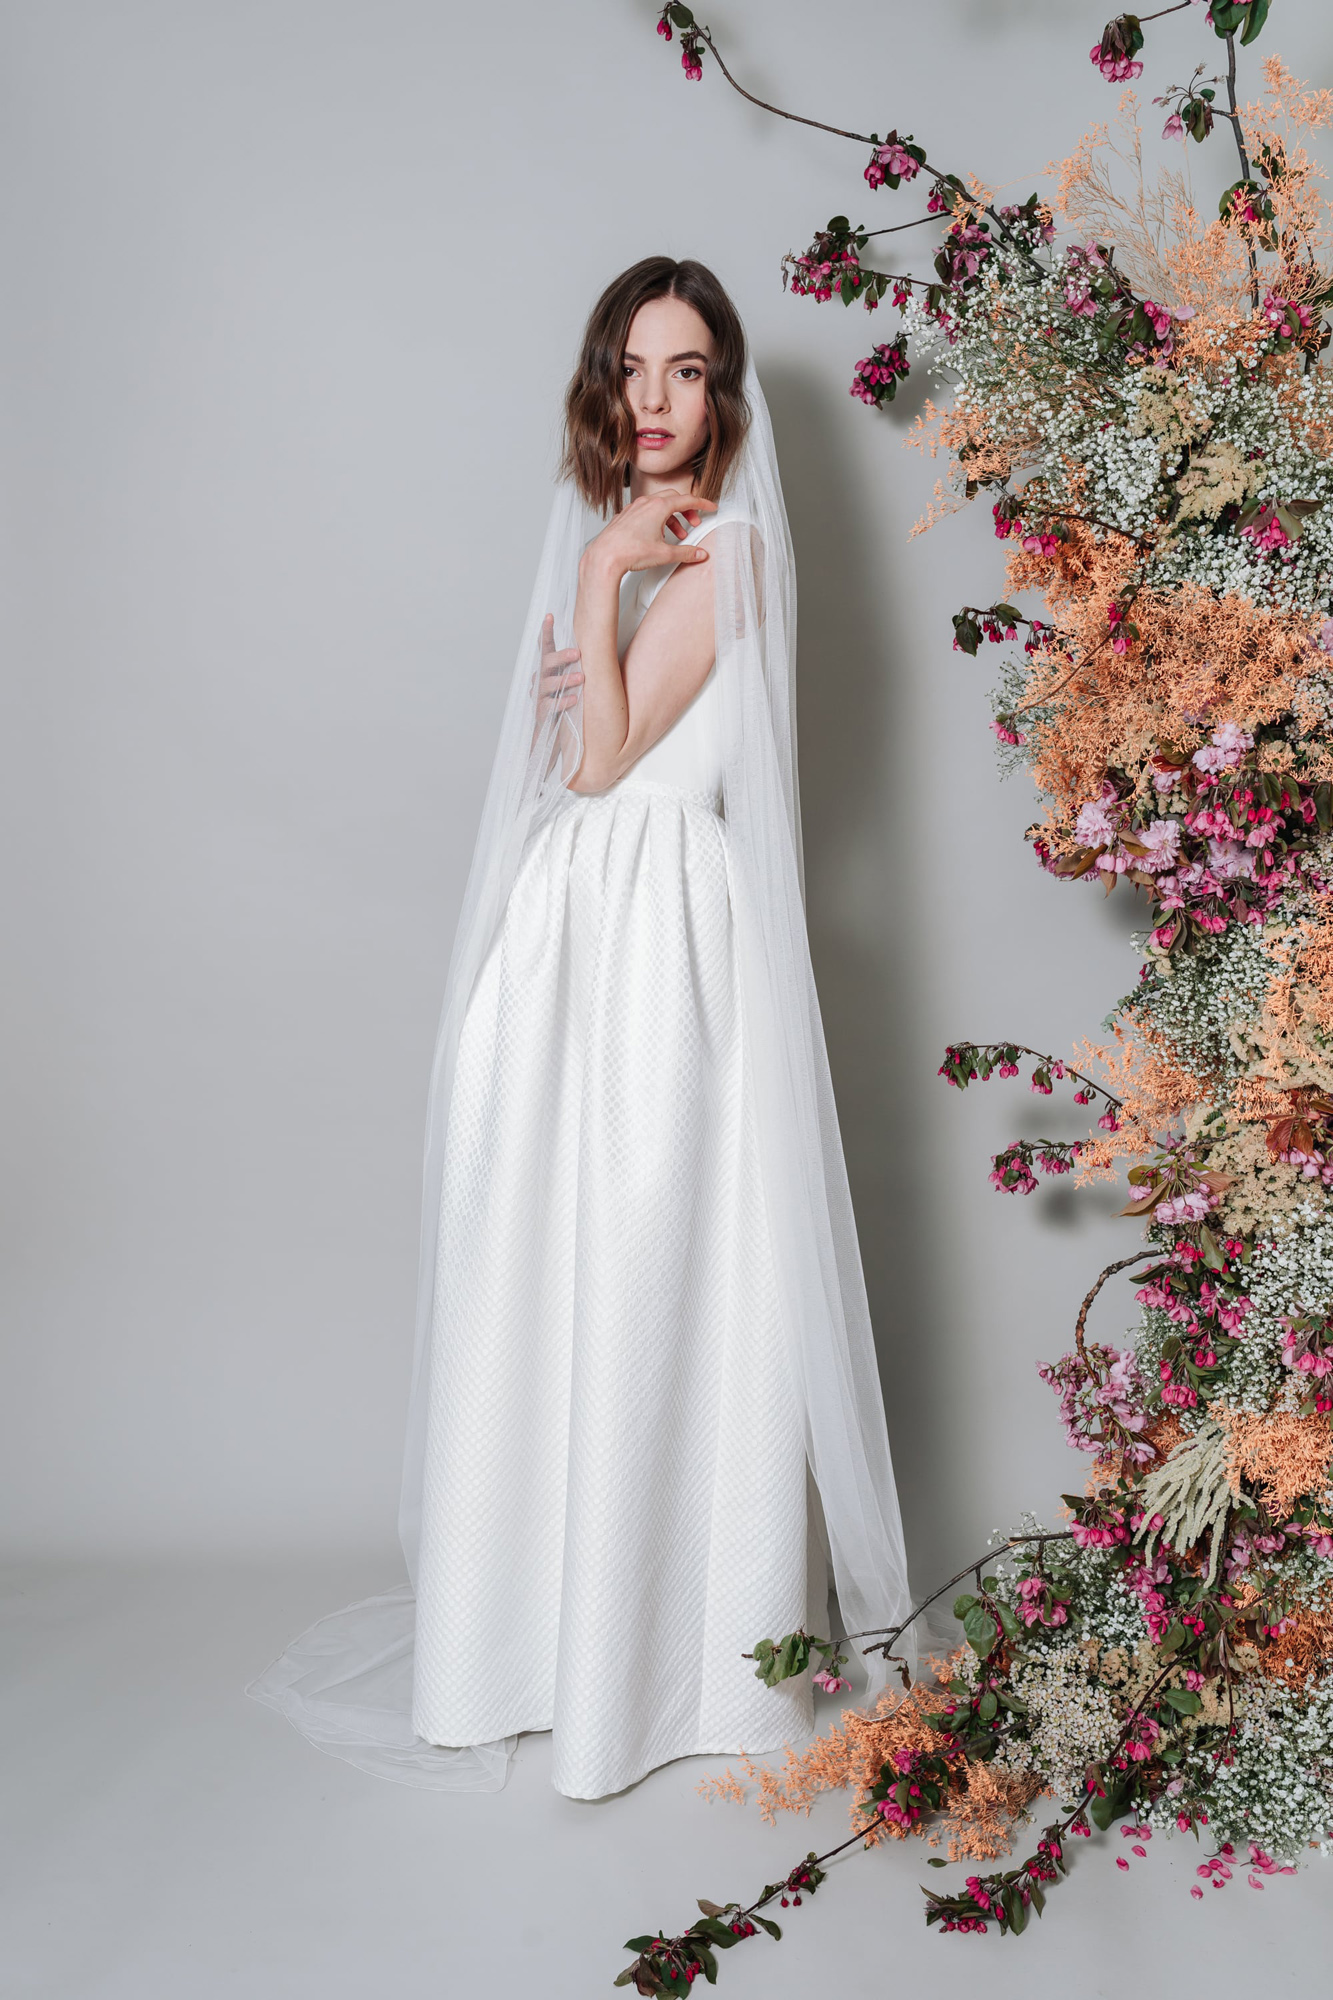 Kate-Beaumont-Sheffield-Zinnia-Modern-Wedding-Gown-Polka-Dot-Pleated-Skirt-15.jpg